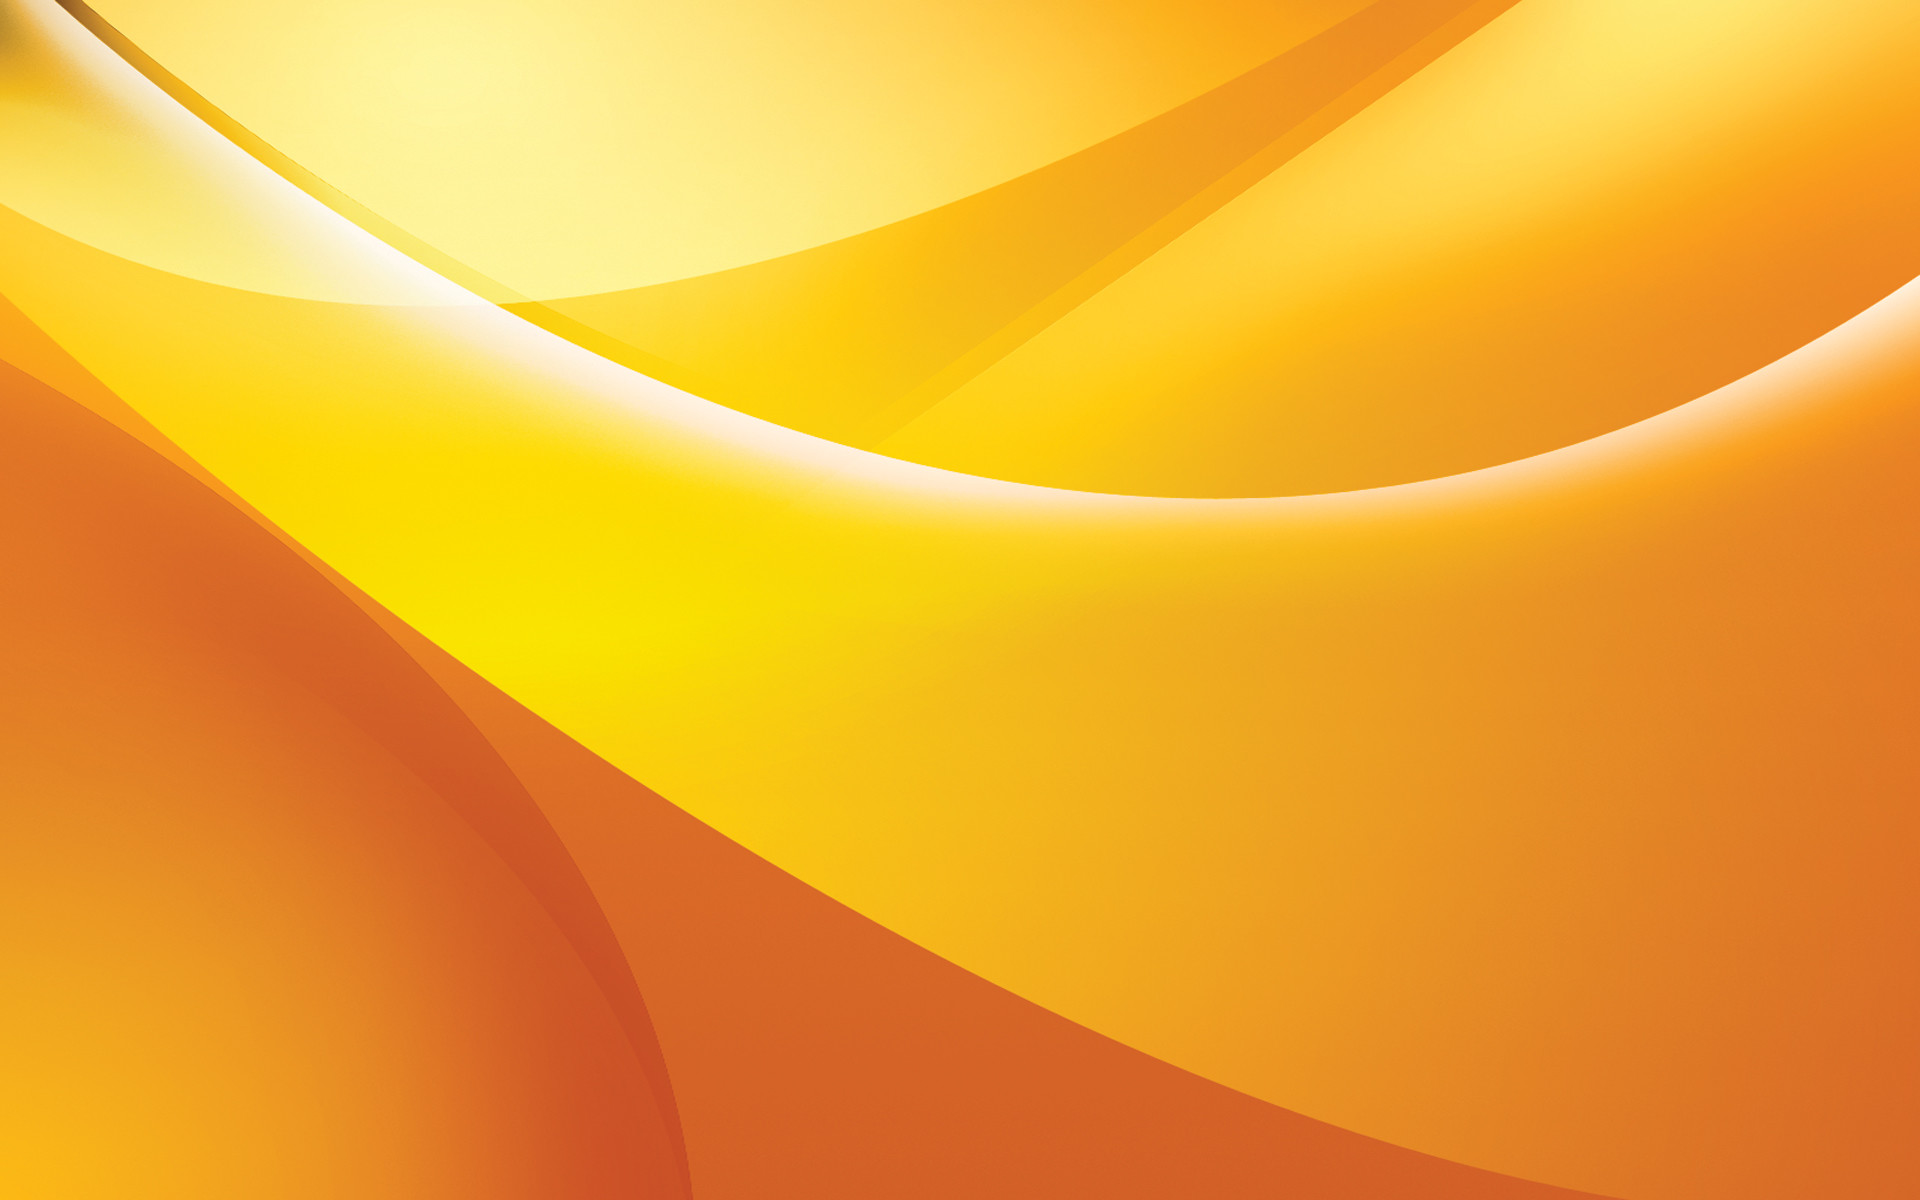 Yellow And White Wallpaper, Free Modern Yellow And White Yellow And White Wallpapers  Wallpapers)